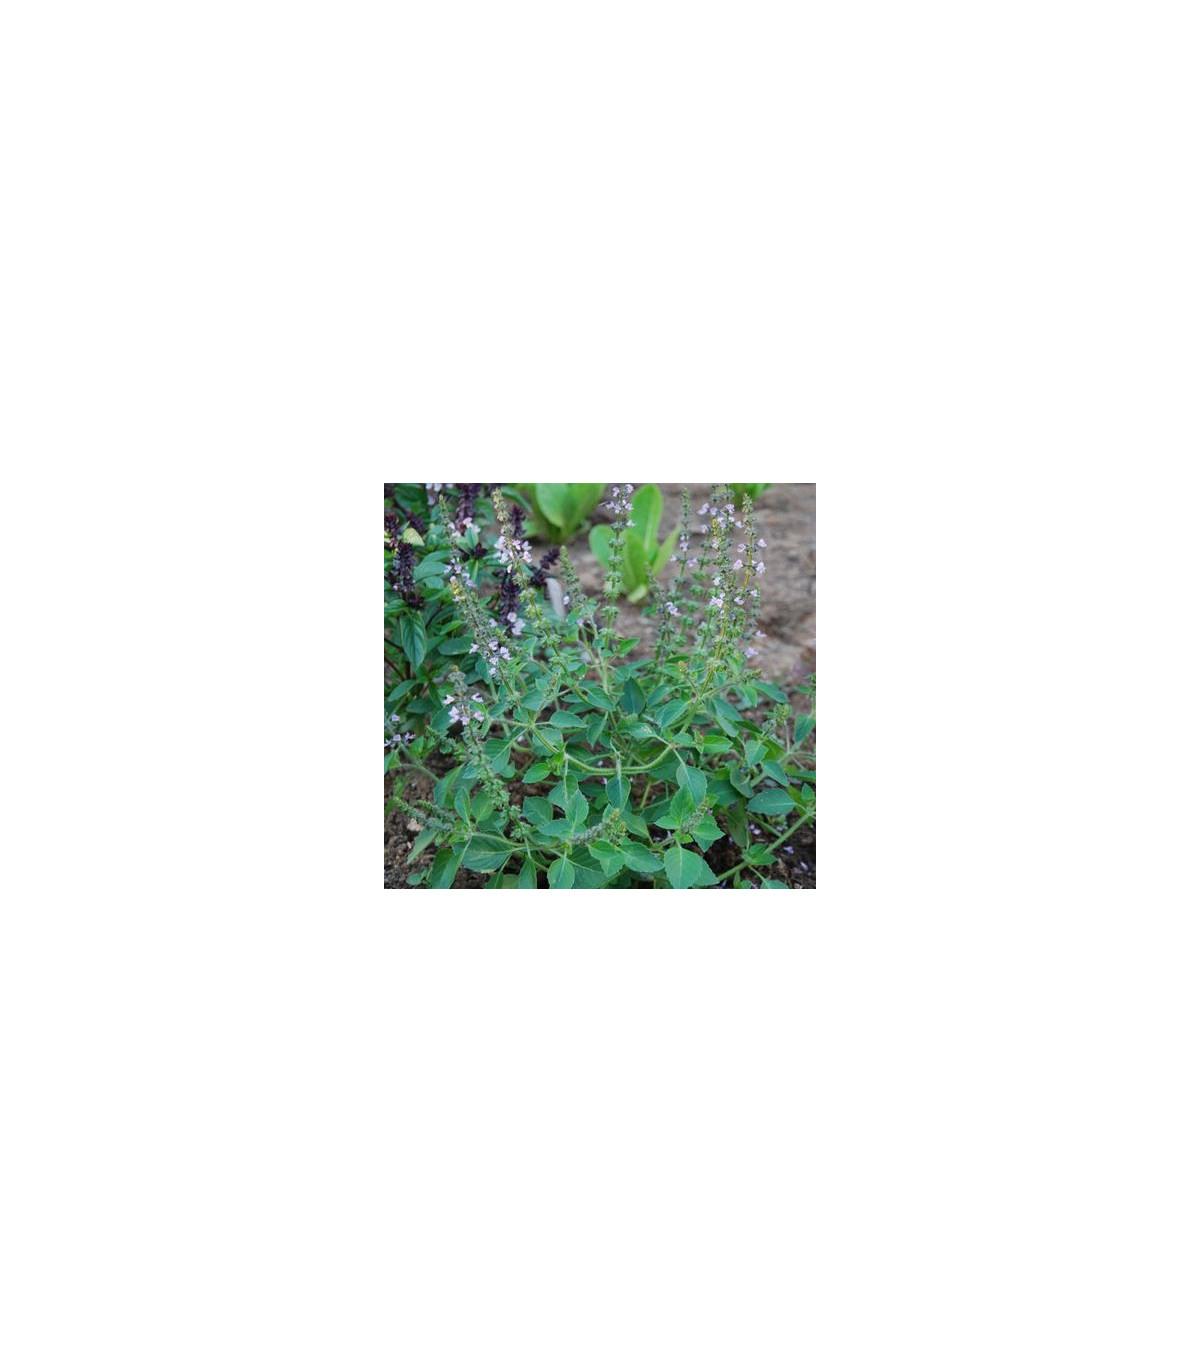 Bazalka pravá Spice - Ocimum basilicum Spice Basil - semená bazalky - 30 ks